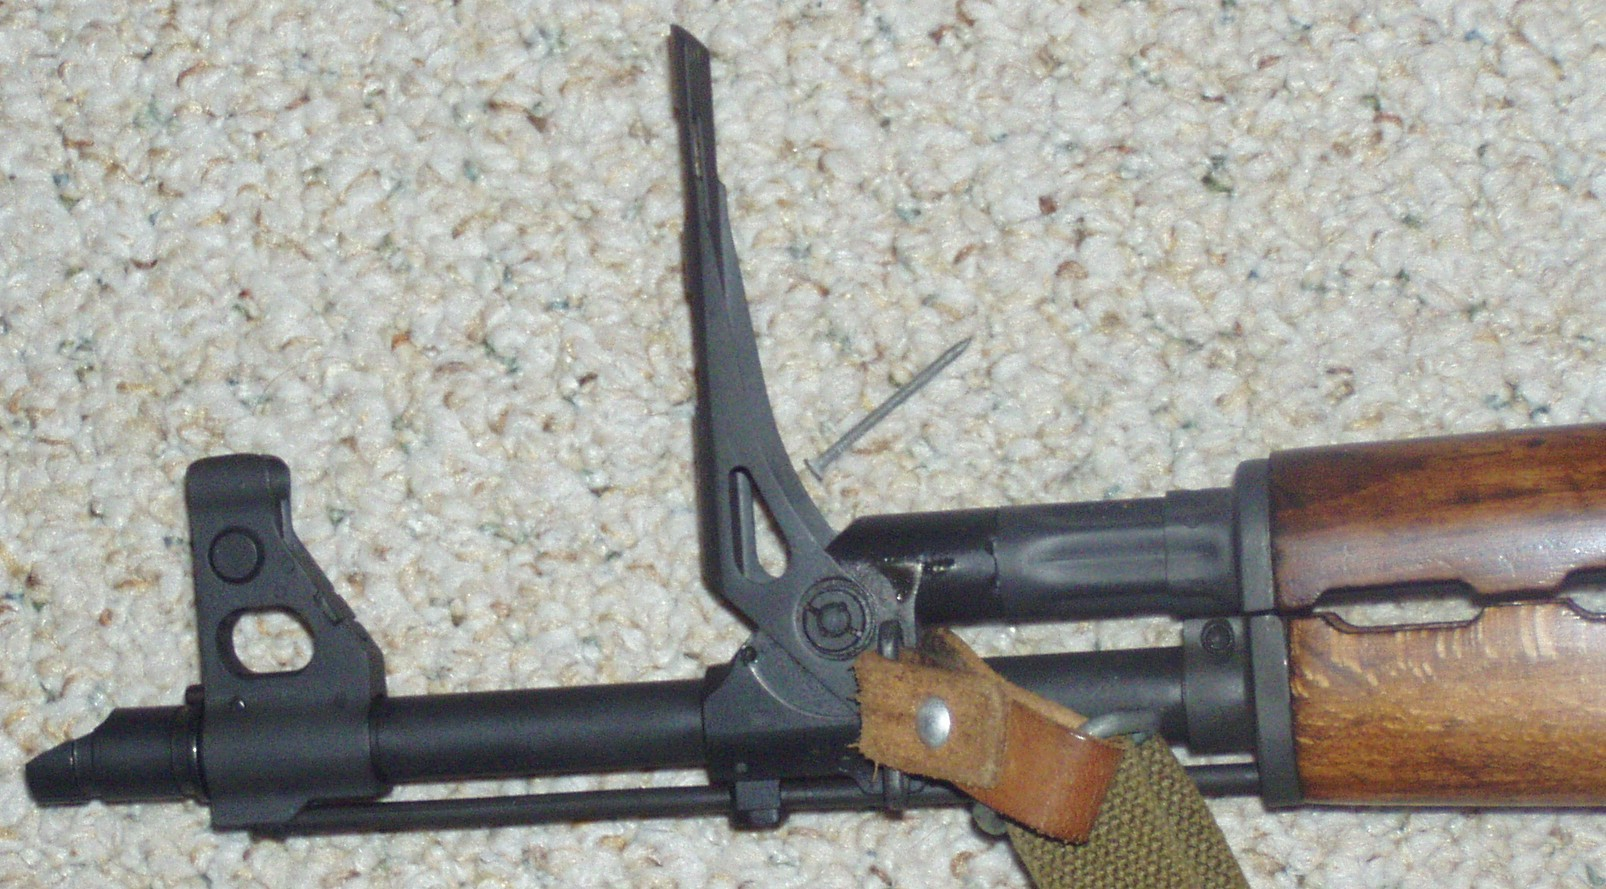 Dodatni poklopni merek za granate je ena od posebnosti M70, ki jo loči od originala.